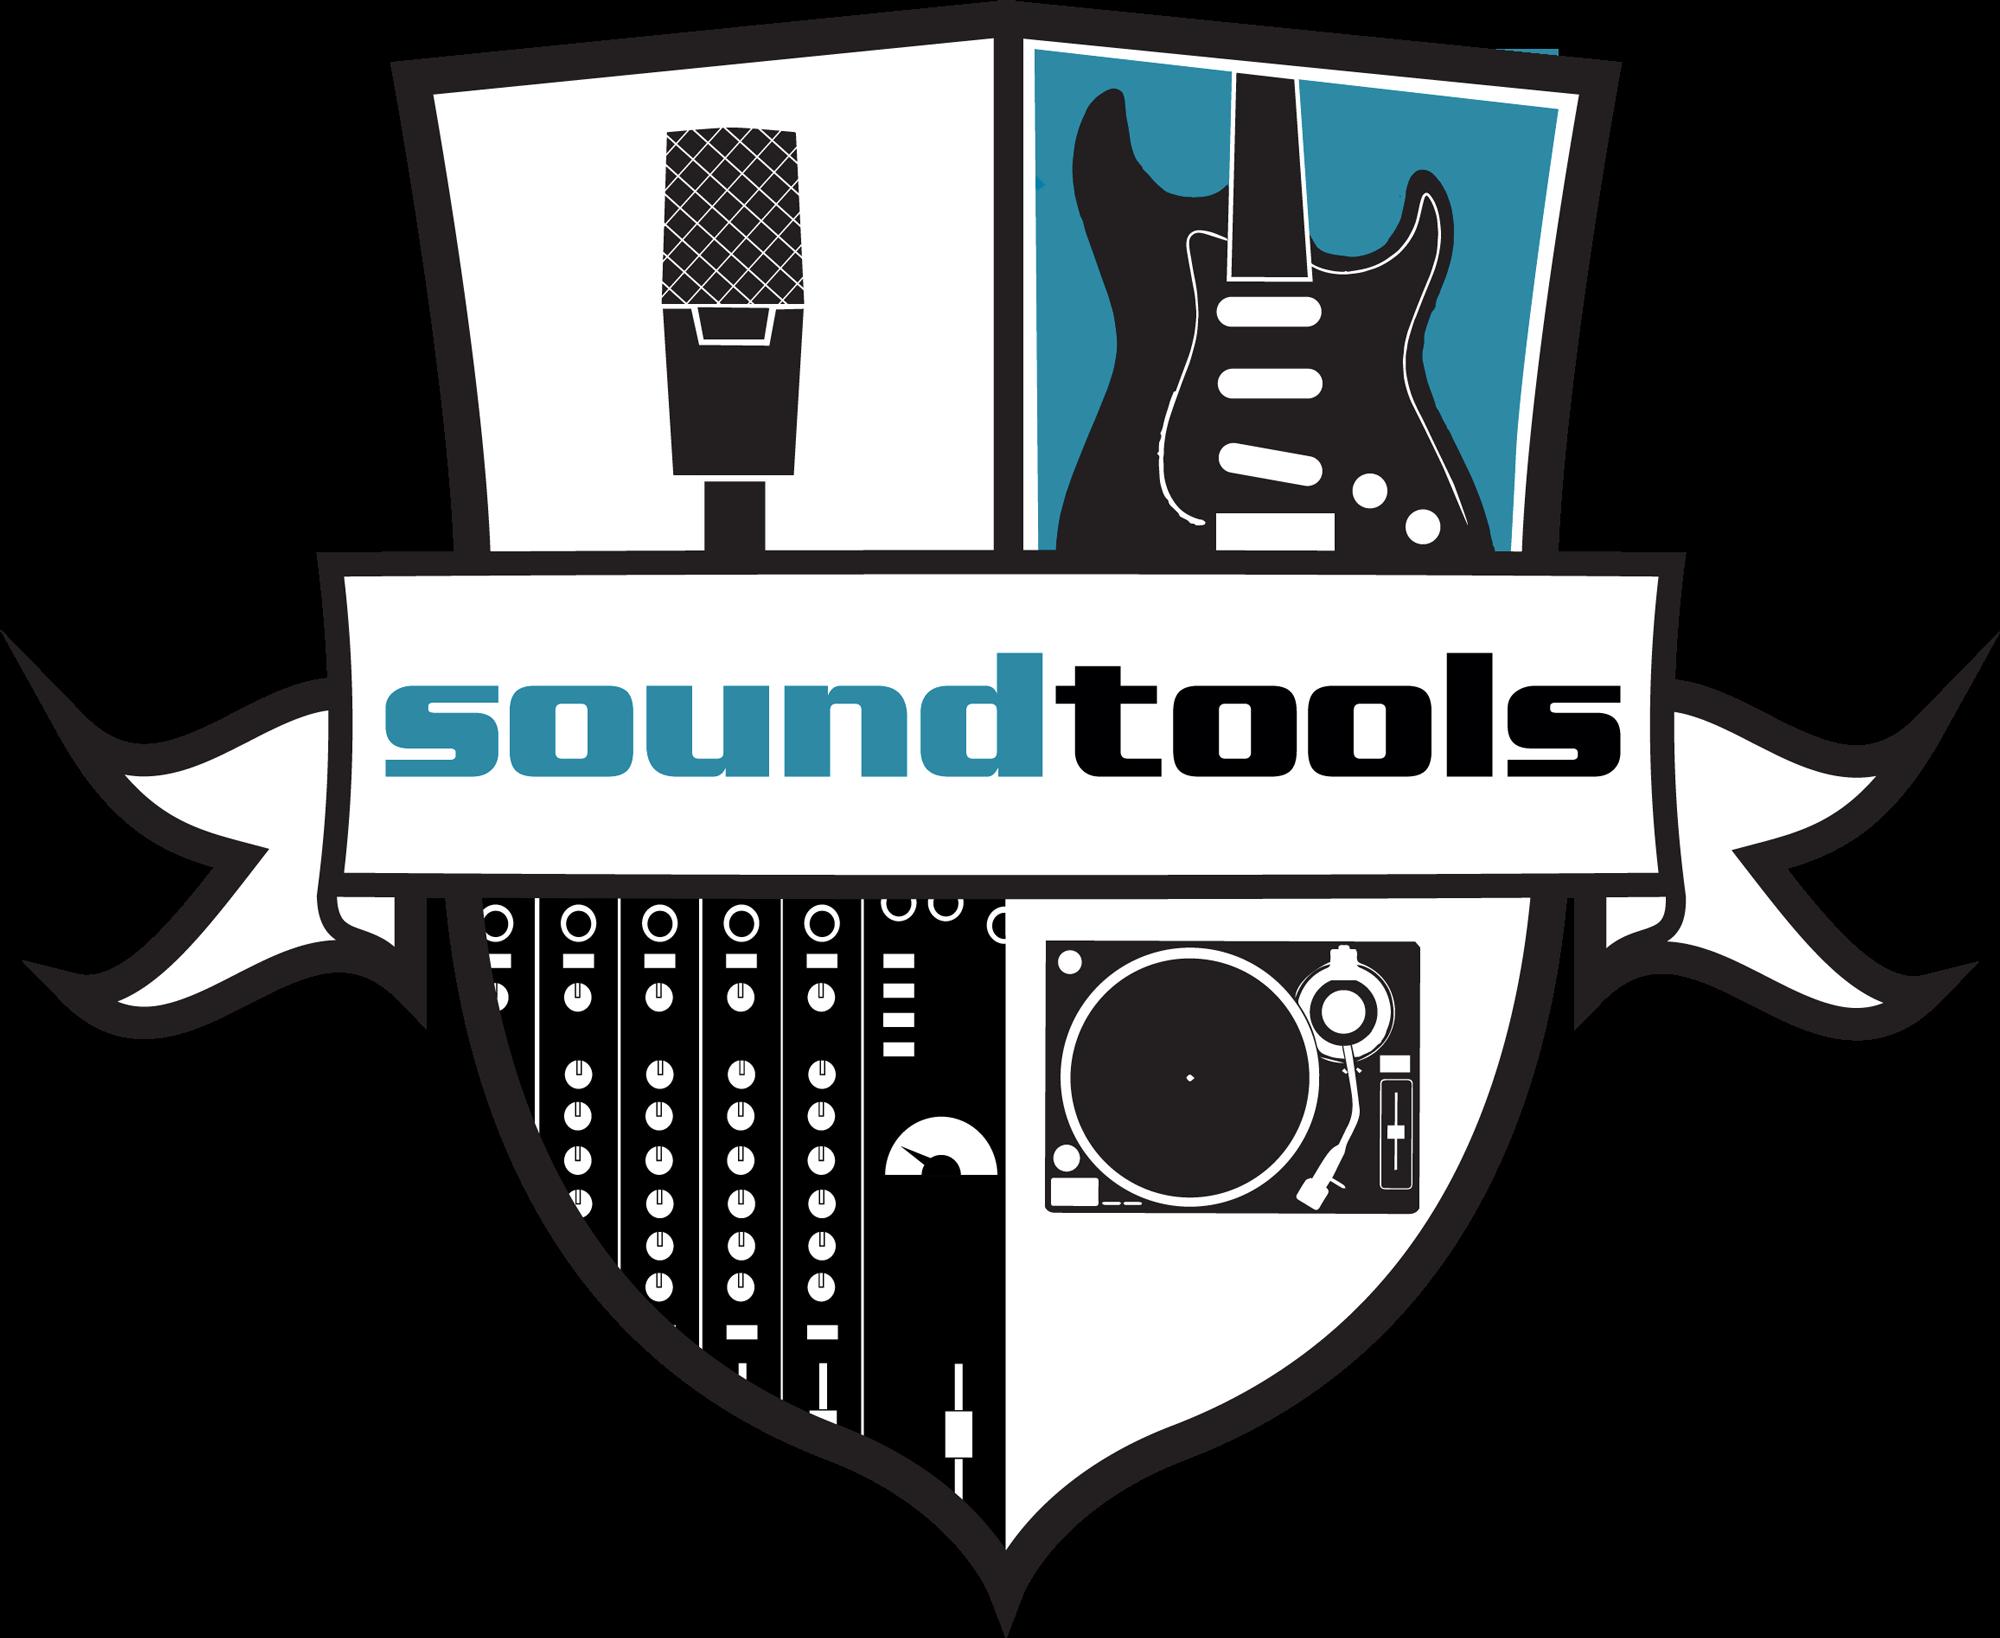 2019-Soundtools-vaakuna-logo.png